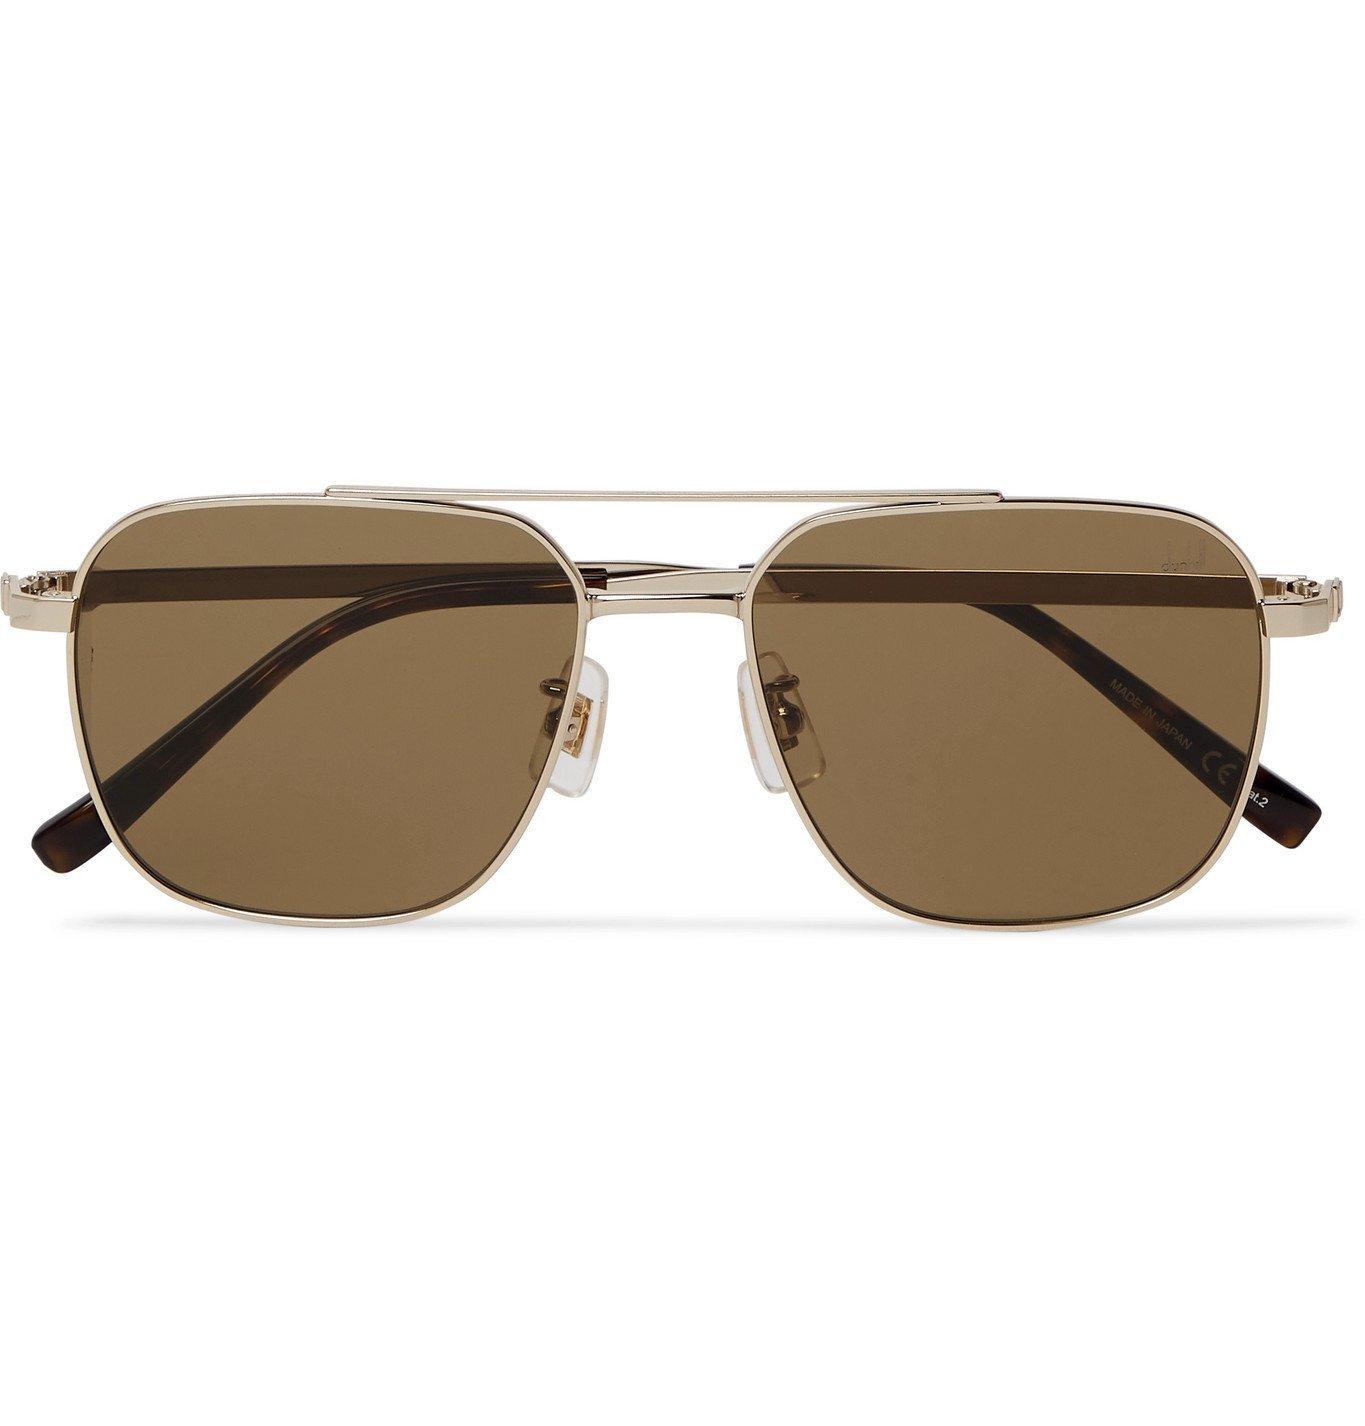 DUNHILL - Aviator-Style Gold-Tone and Tortoiseshell Acetate Sunglasses - Gold